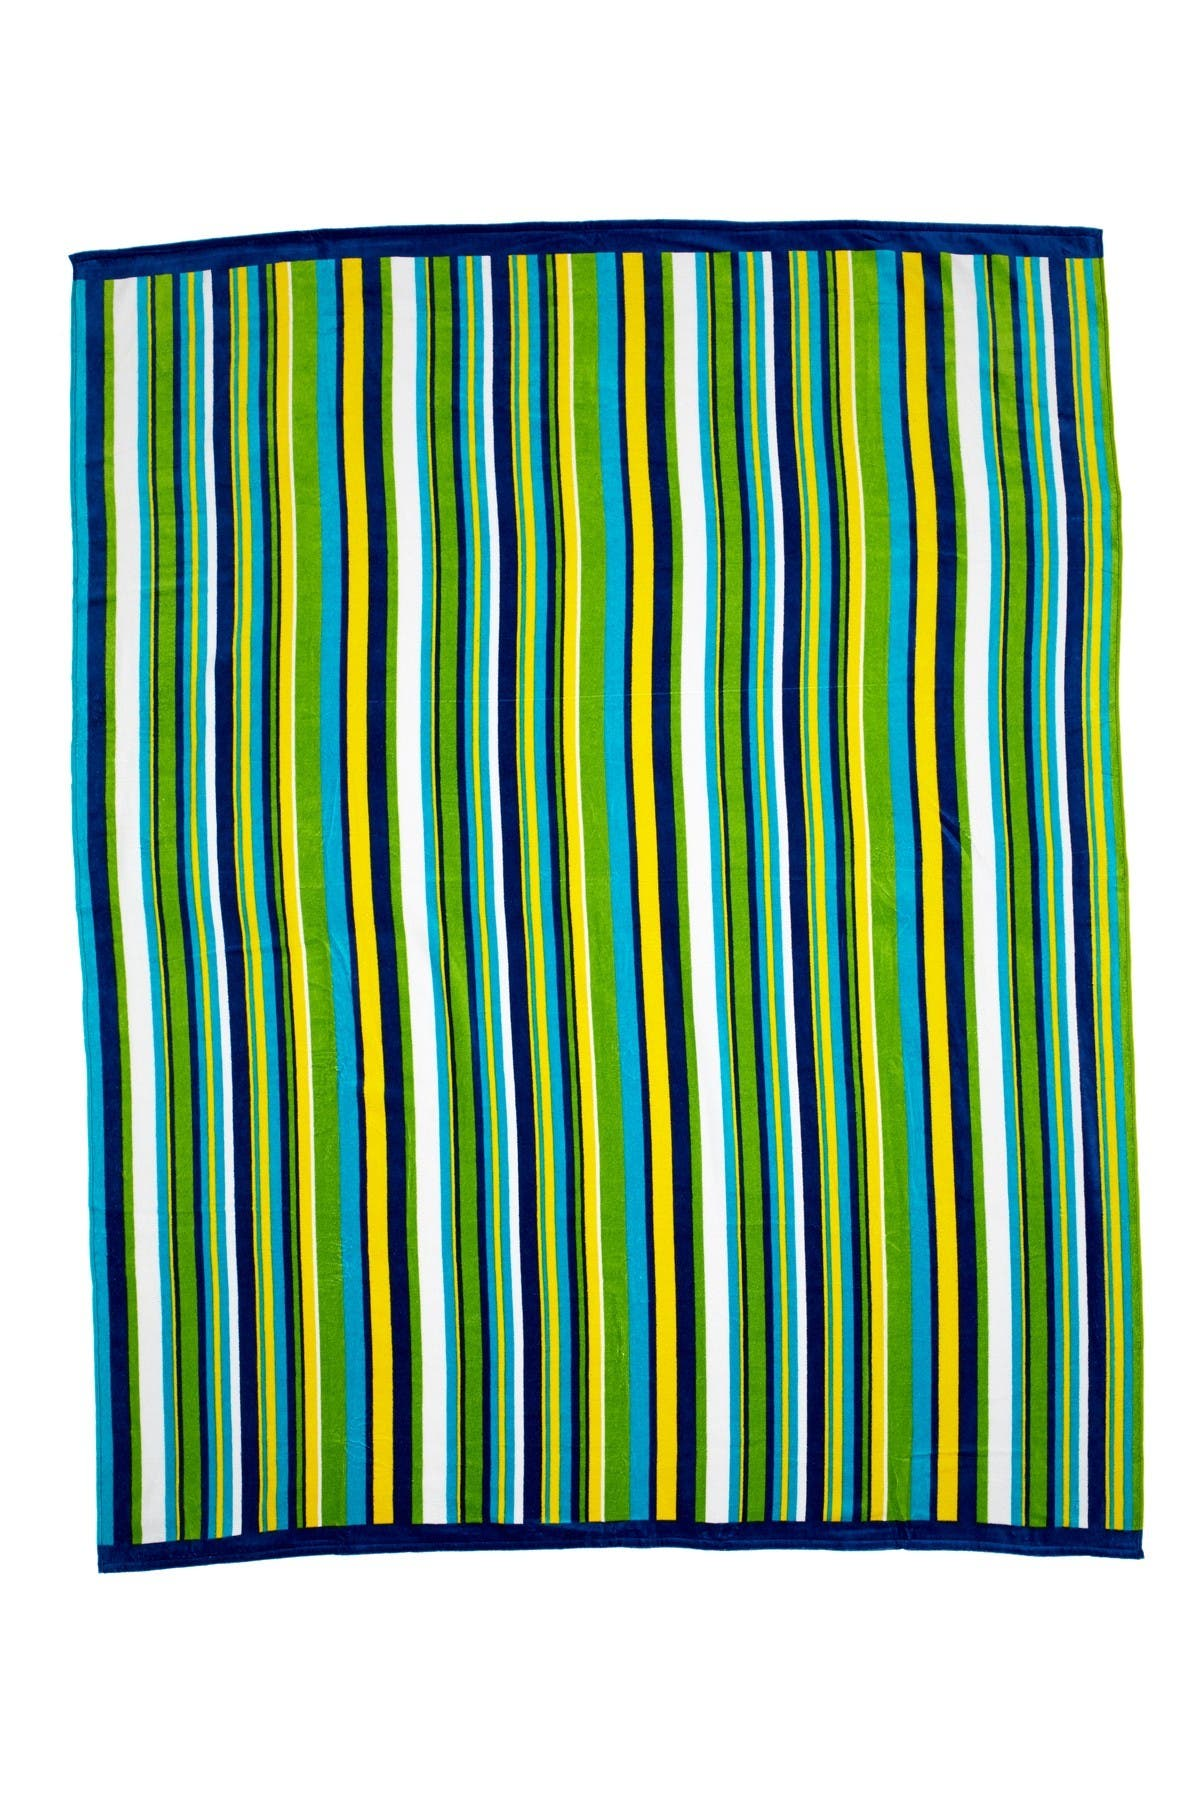 Image of Apollo Towels Cotton Beach Towel